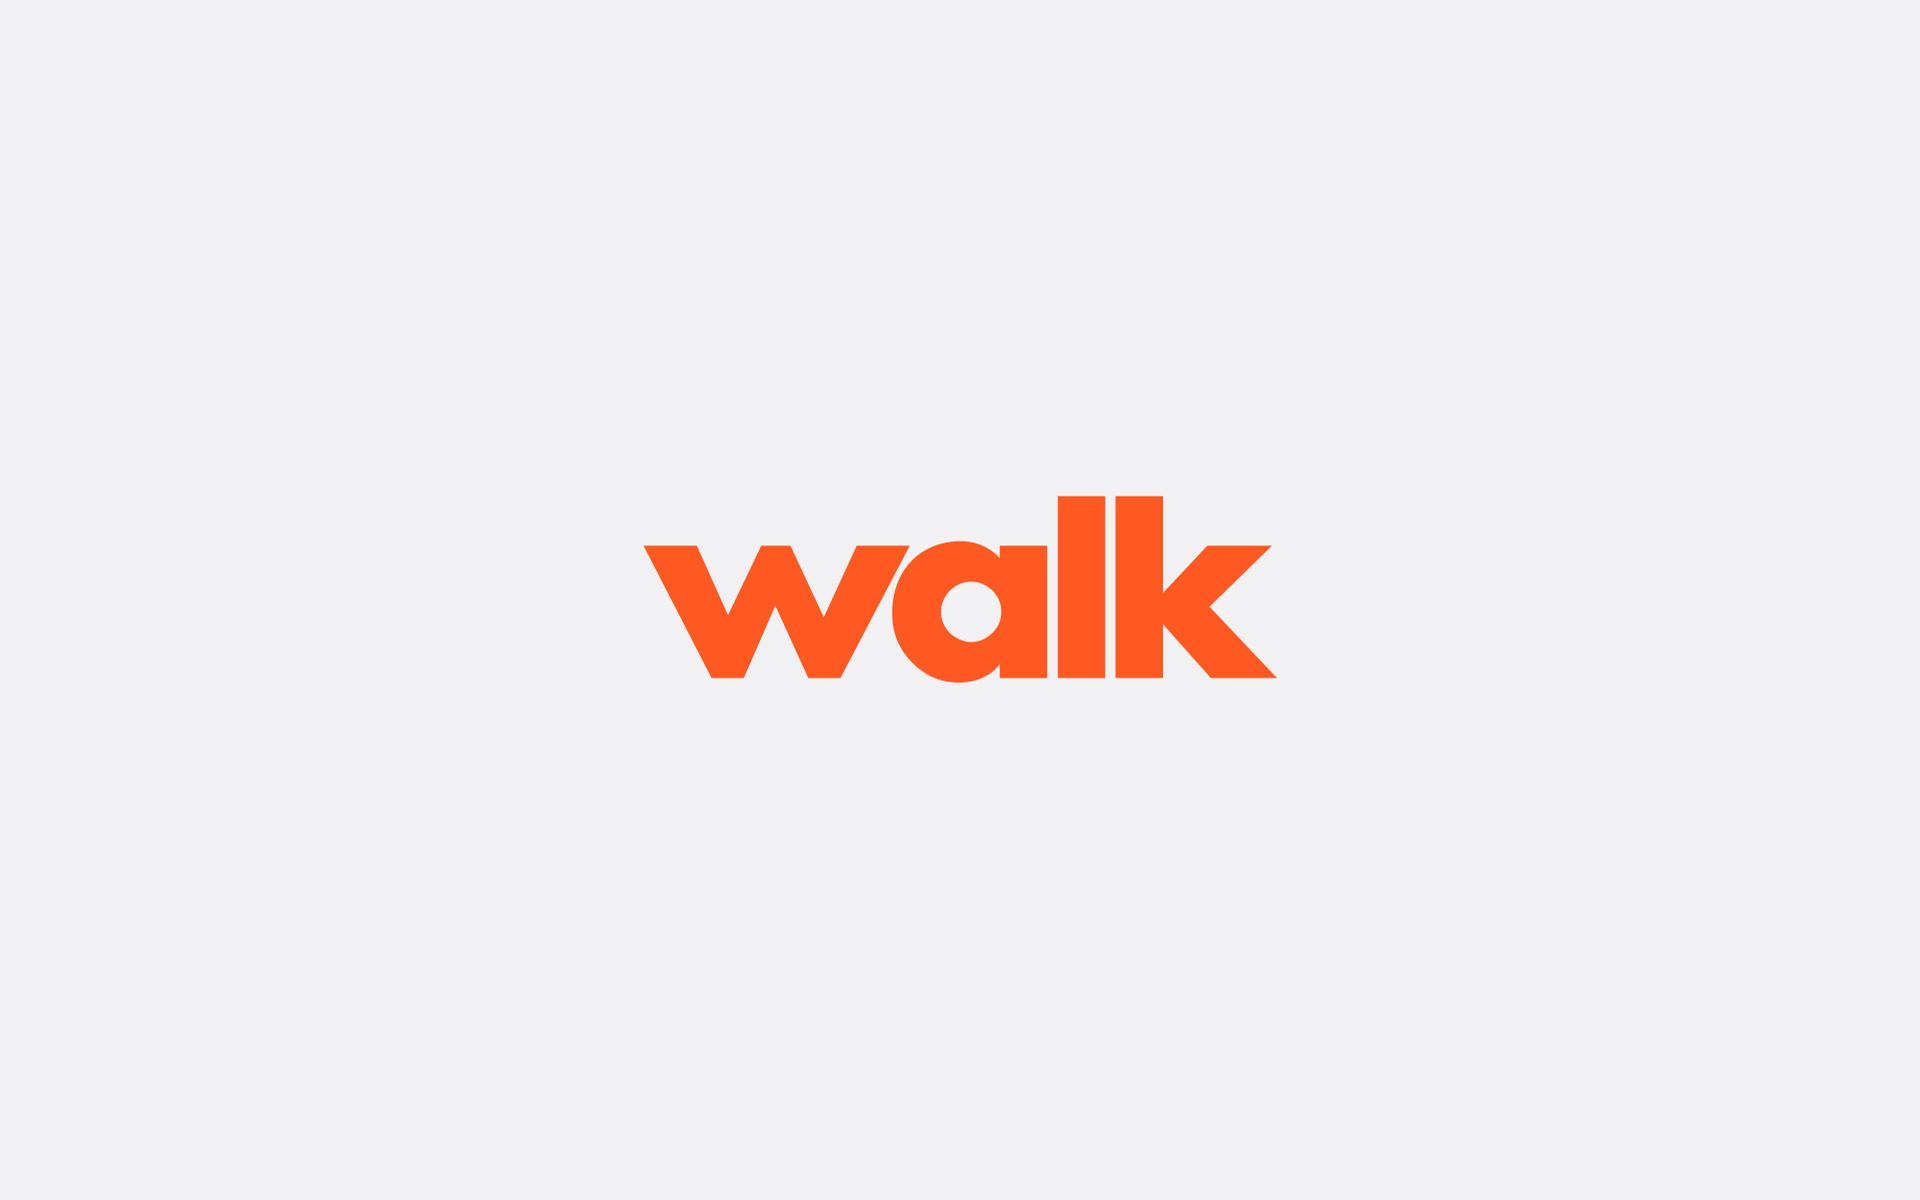 Walk-Missions-Brand-Identity-Design_2